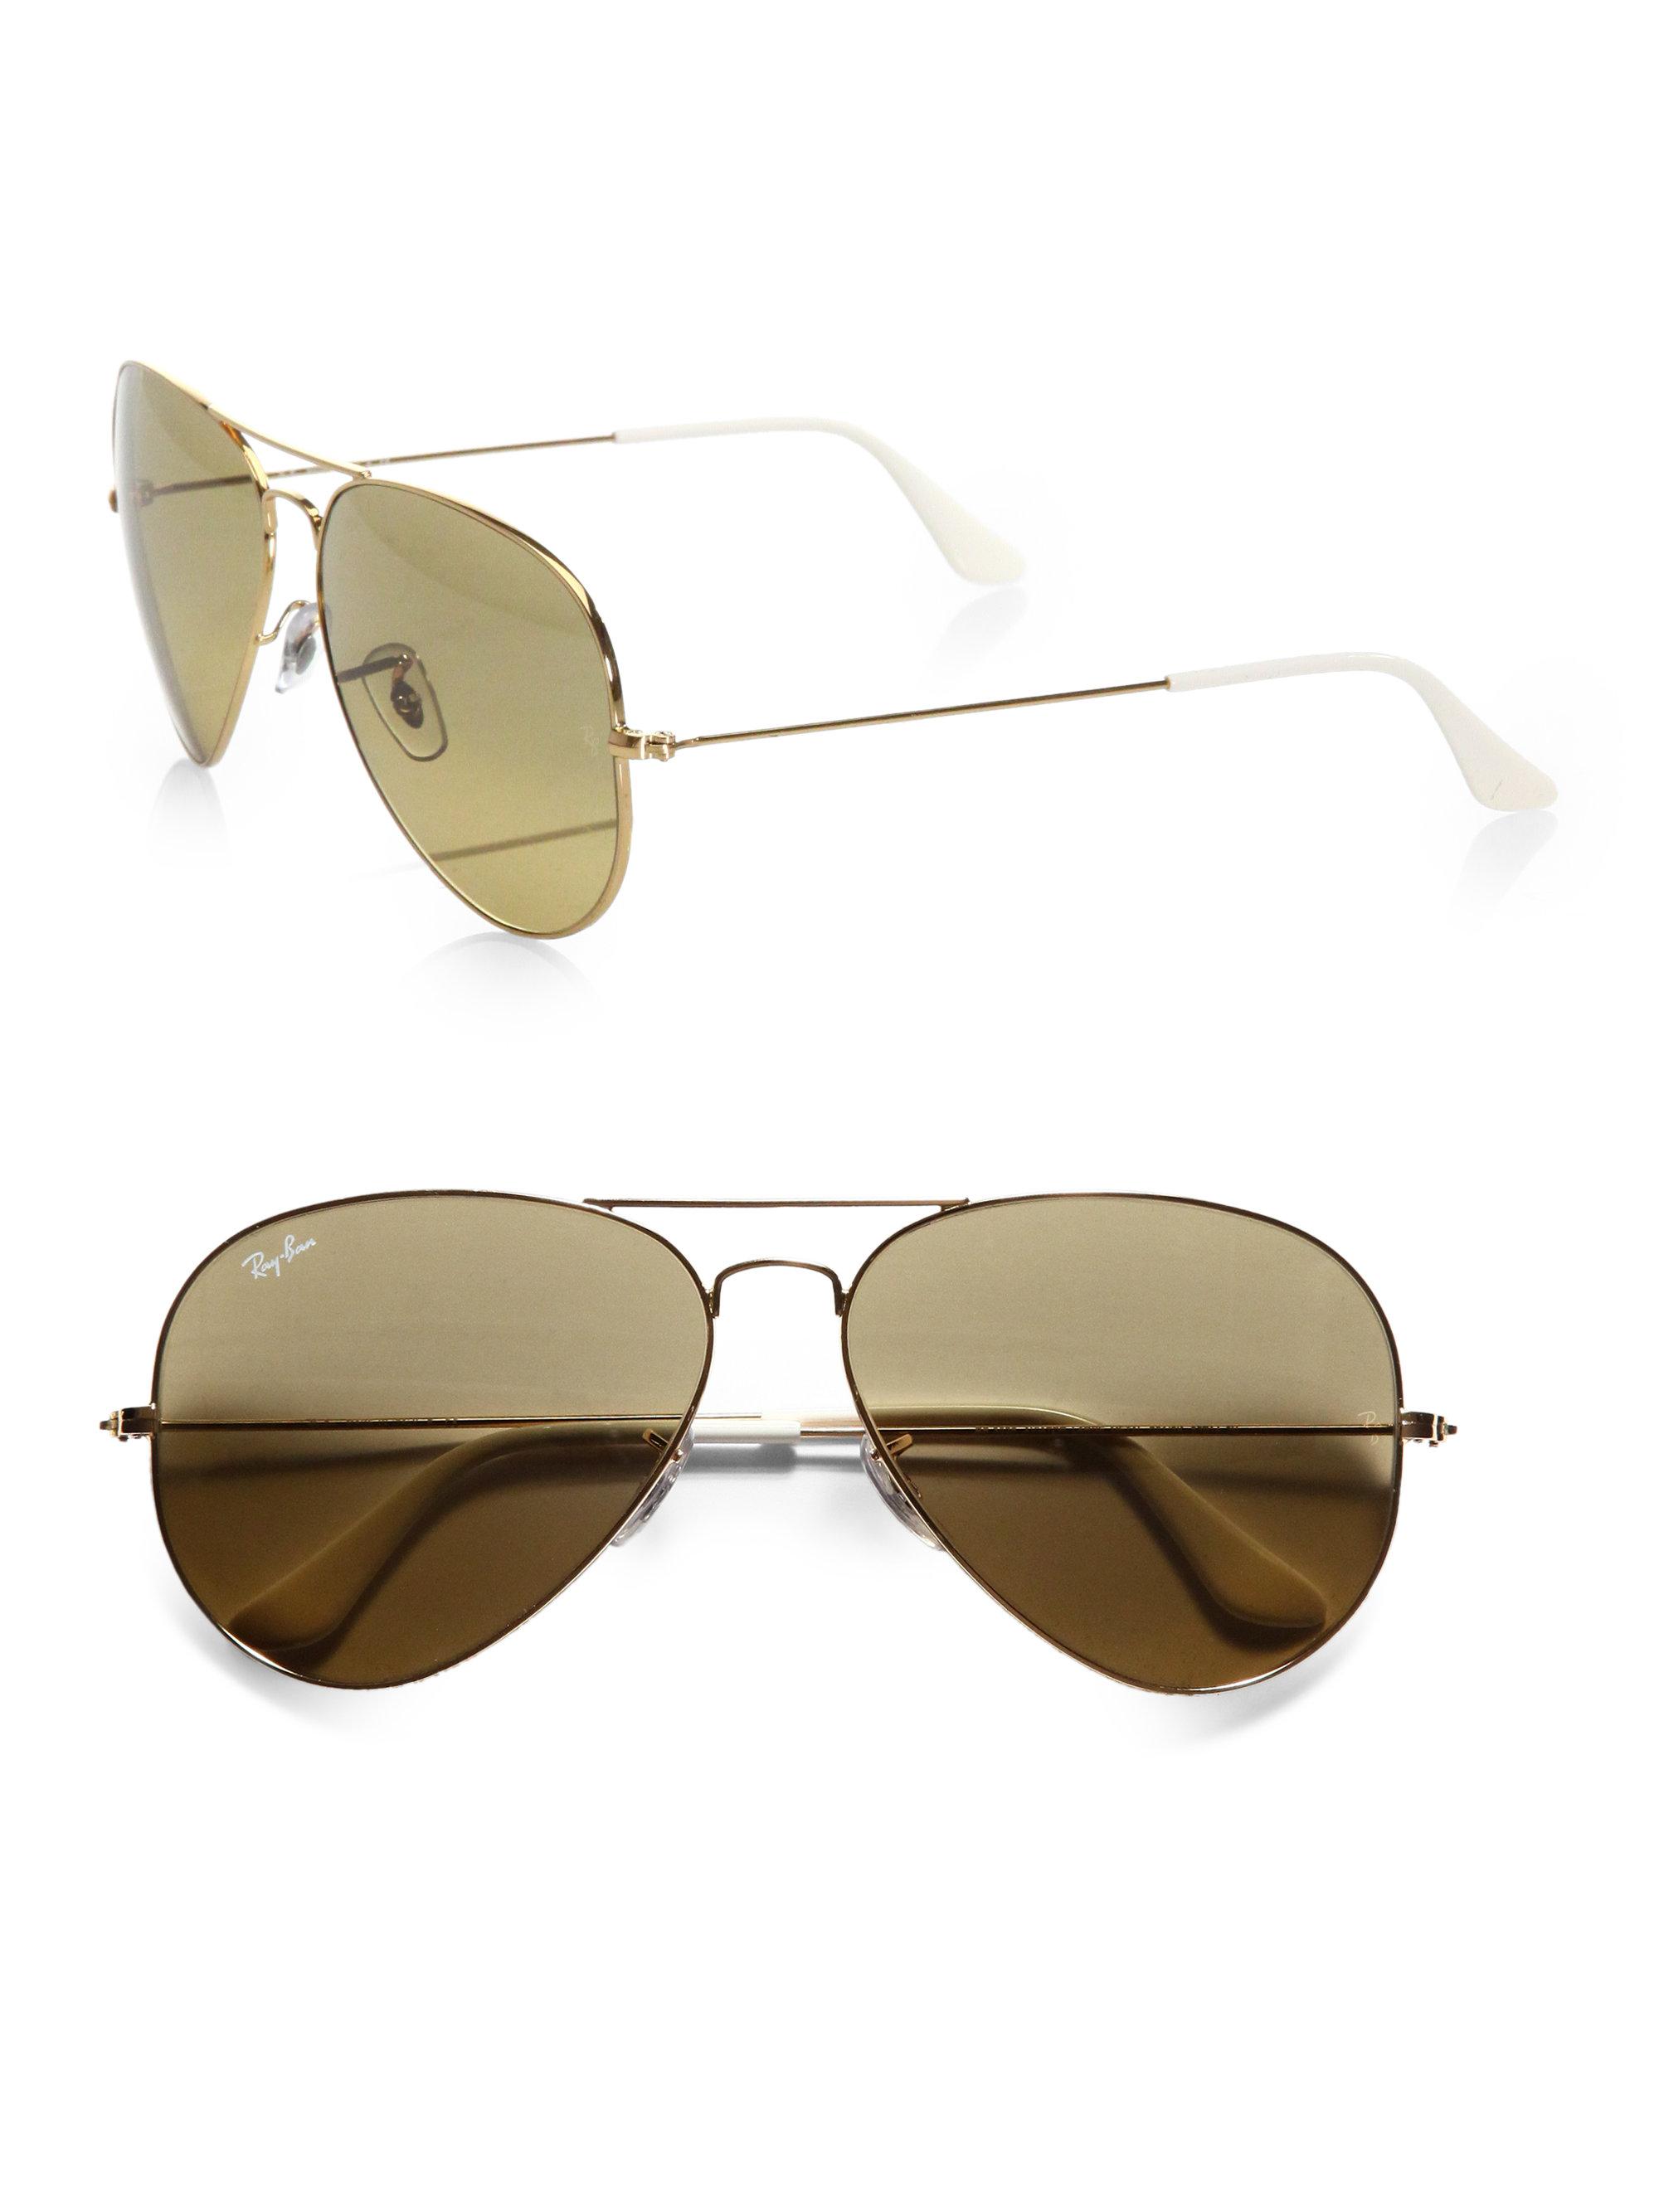 Wildfox 'Catfarer' Sunglasses | eBay